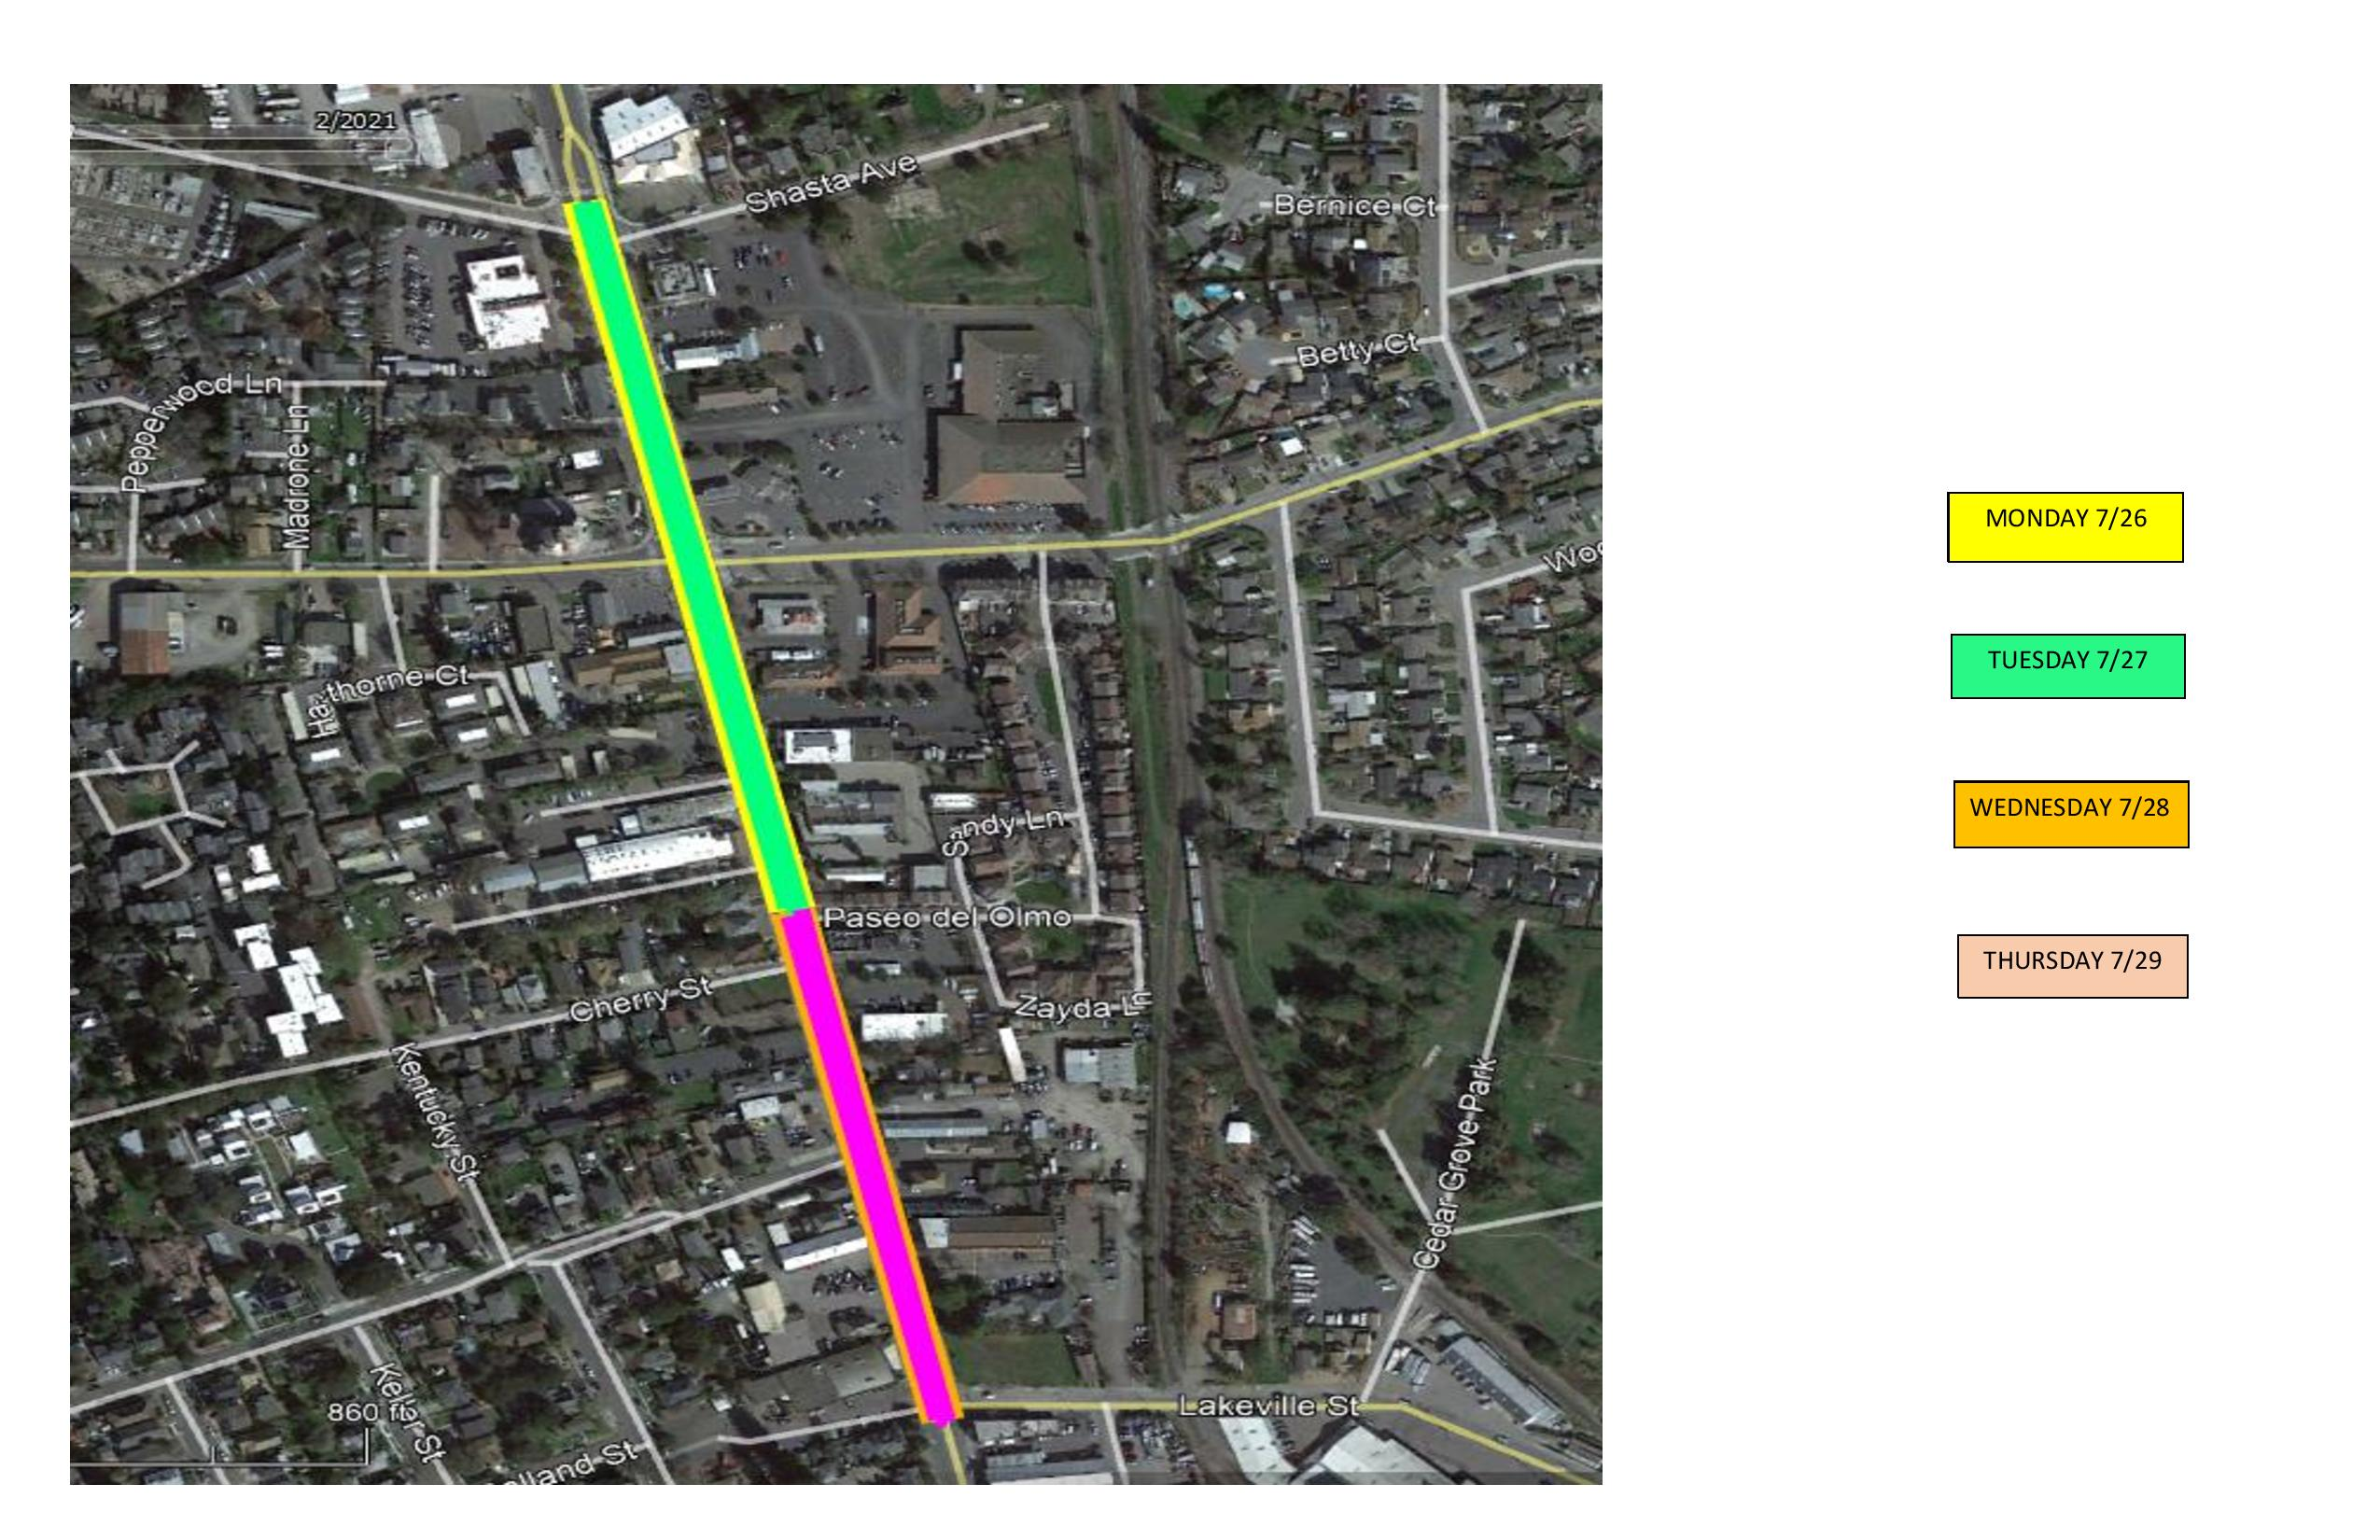 Pavement Map 2 7_26 thru 7_29